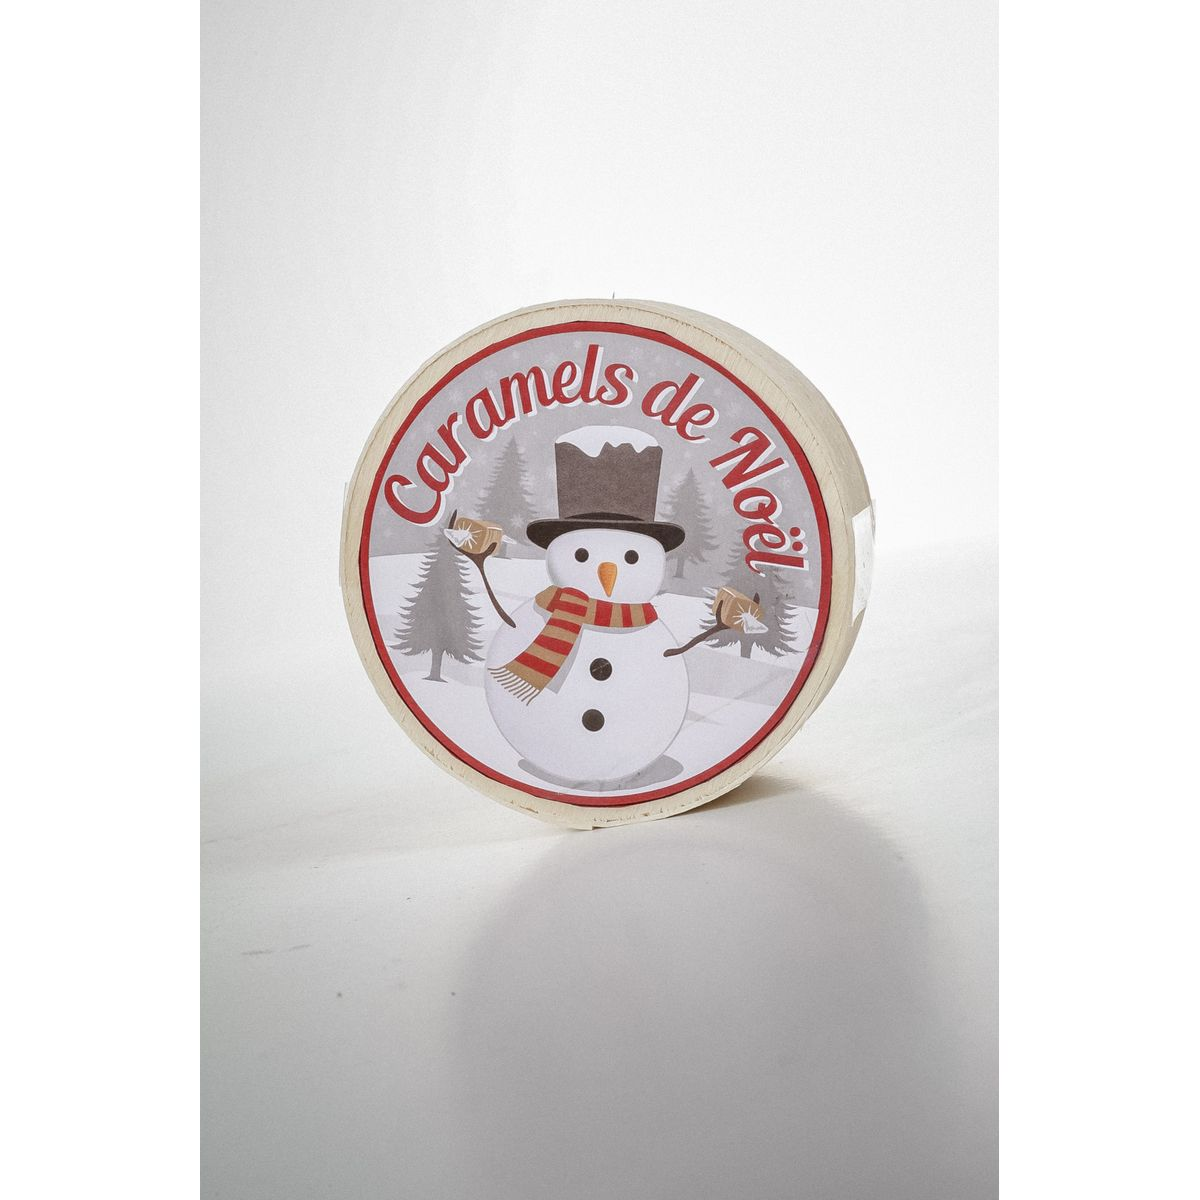 Mini boîte caramel de Noël 50g - La Maison d'Armorine